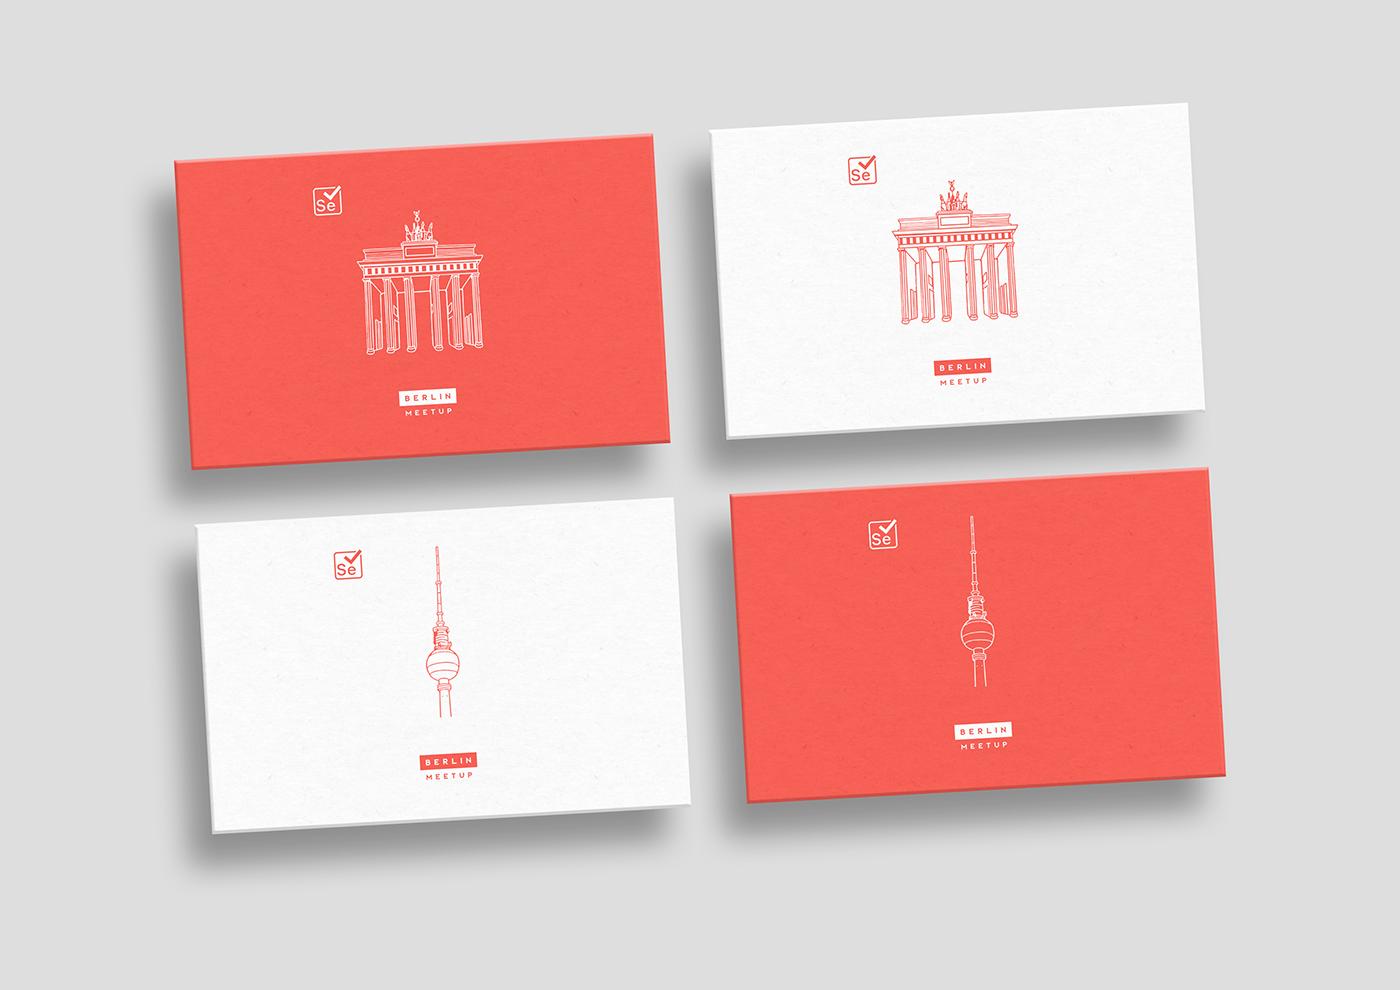 nsjatkinson,graphic design ,ILLUSTRATION ,branding ,identity,logo,Startup,Selenium,sketch,Drawing